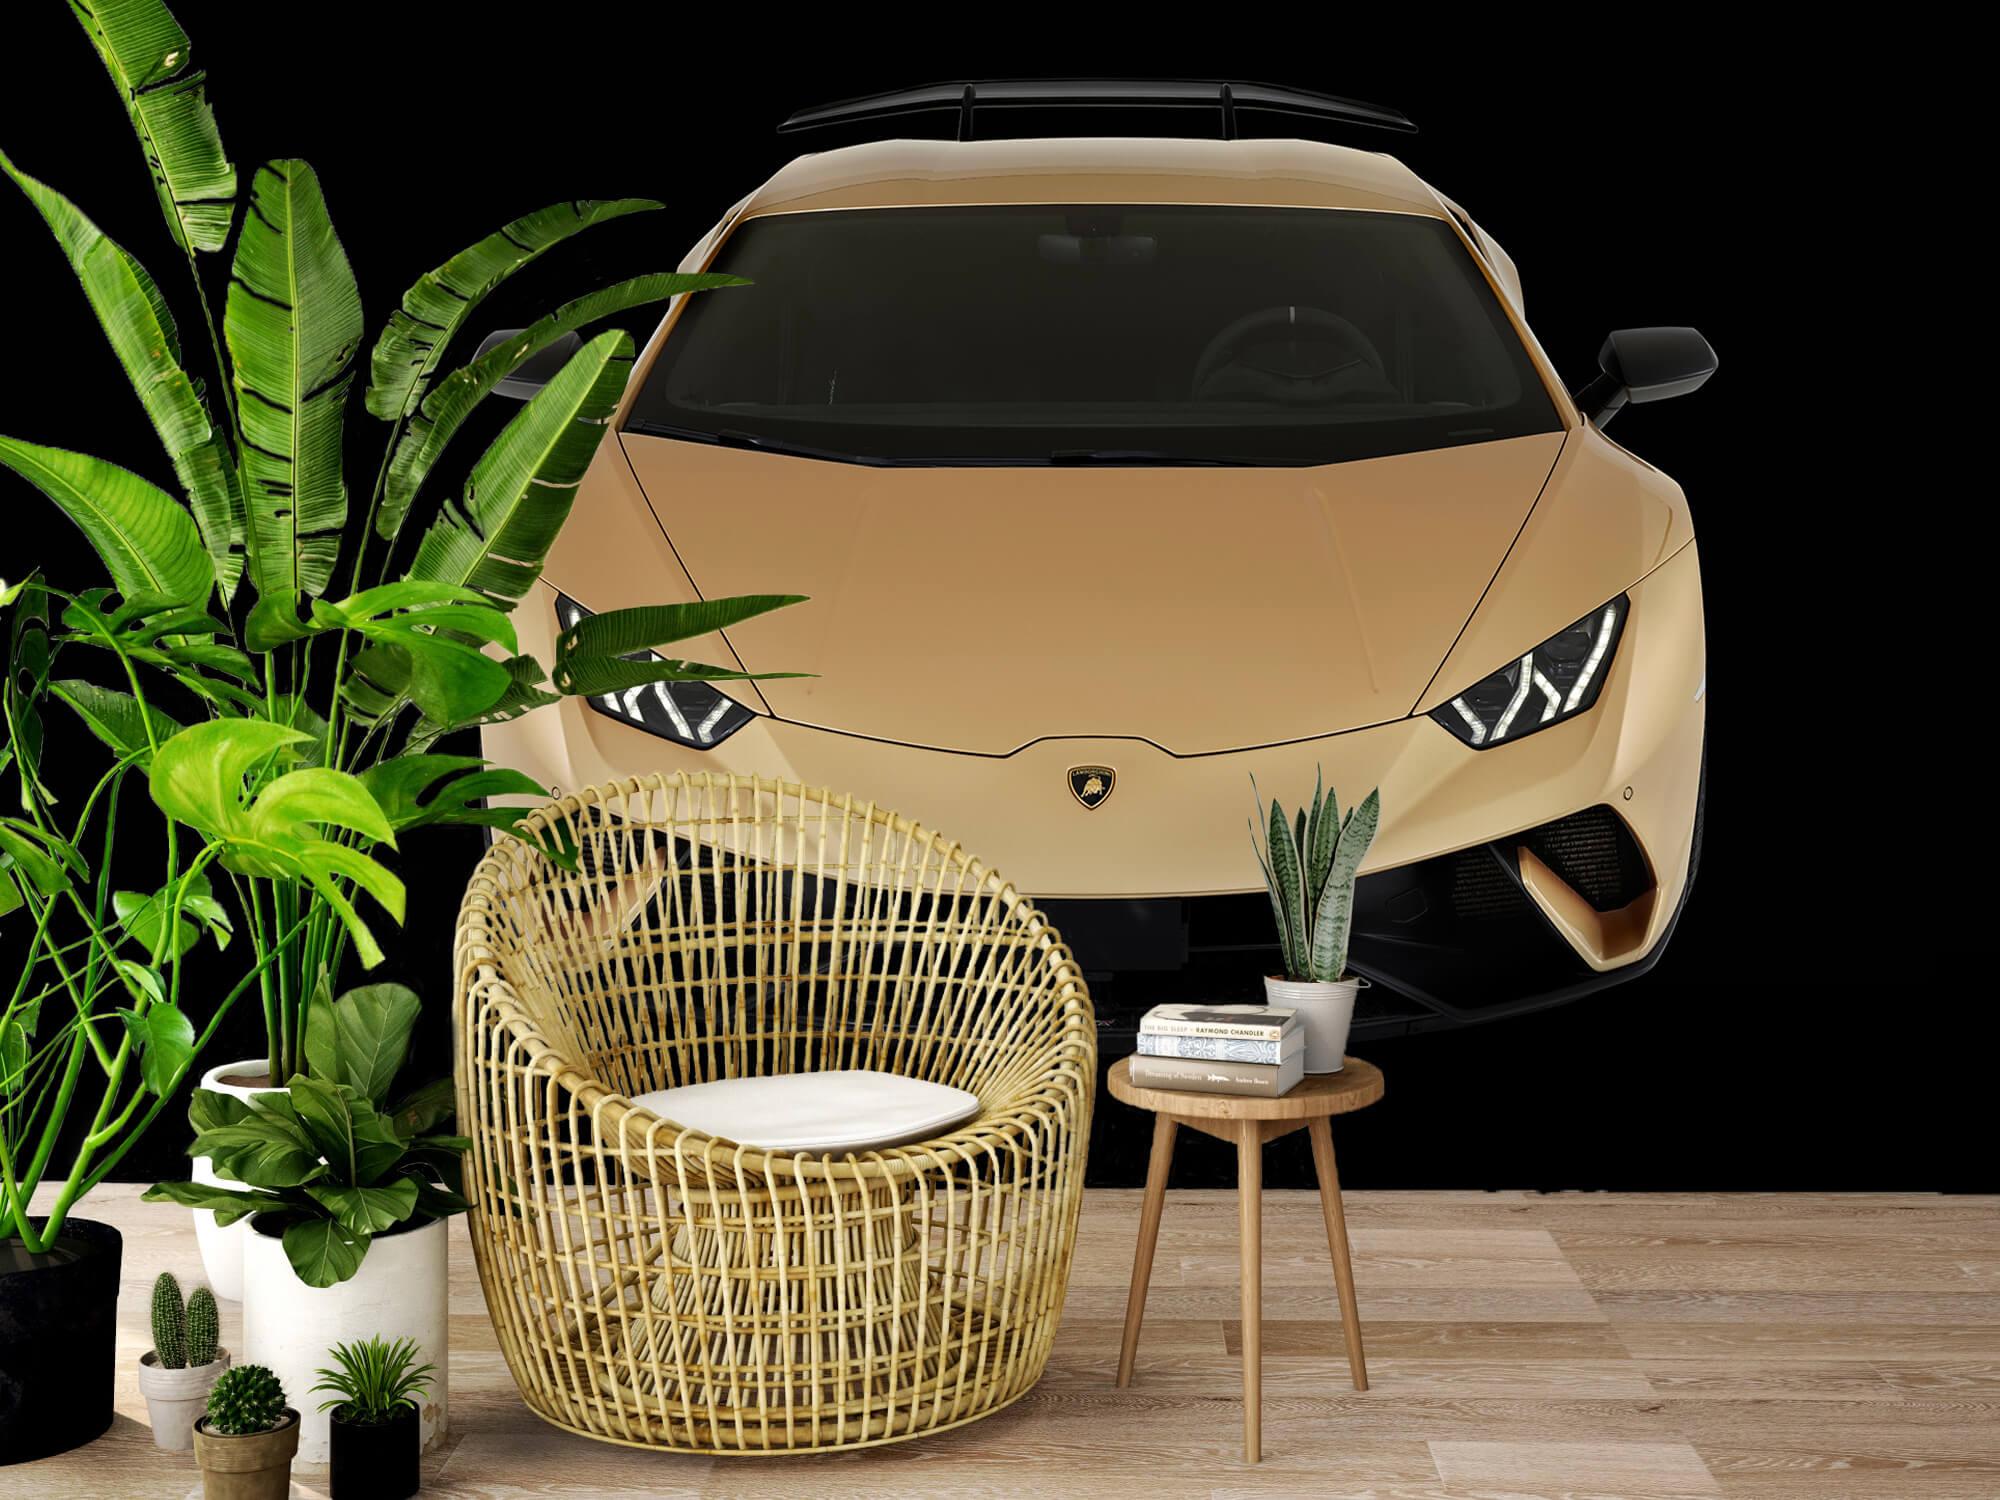 Wallpaper Lamborghini Huracán - Avant du dessus, noir 5